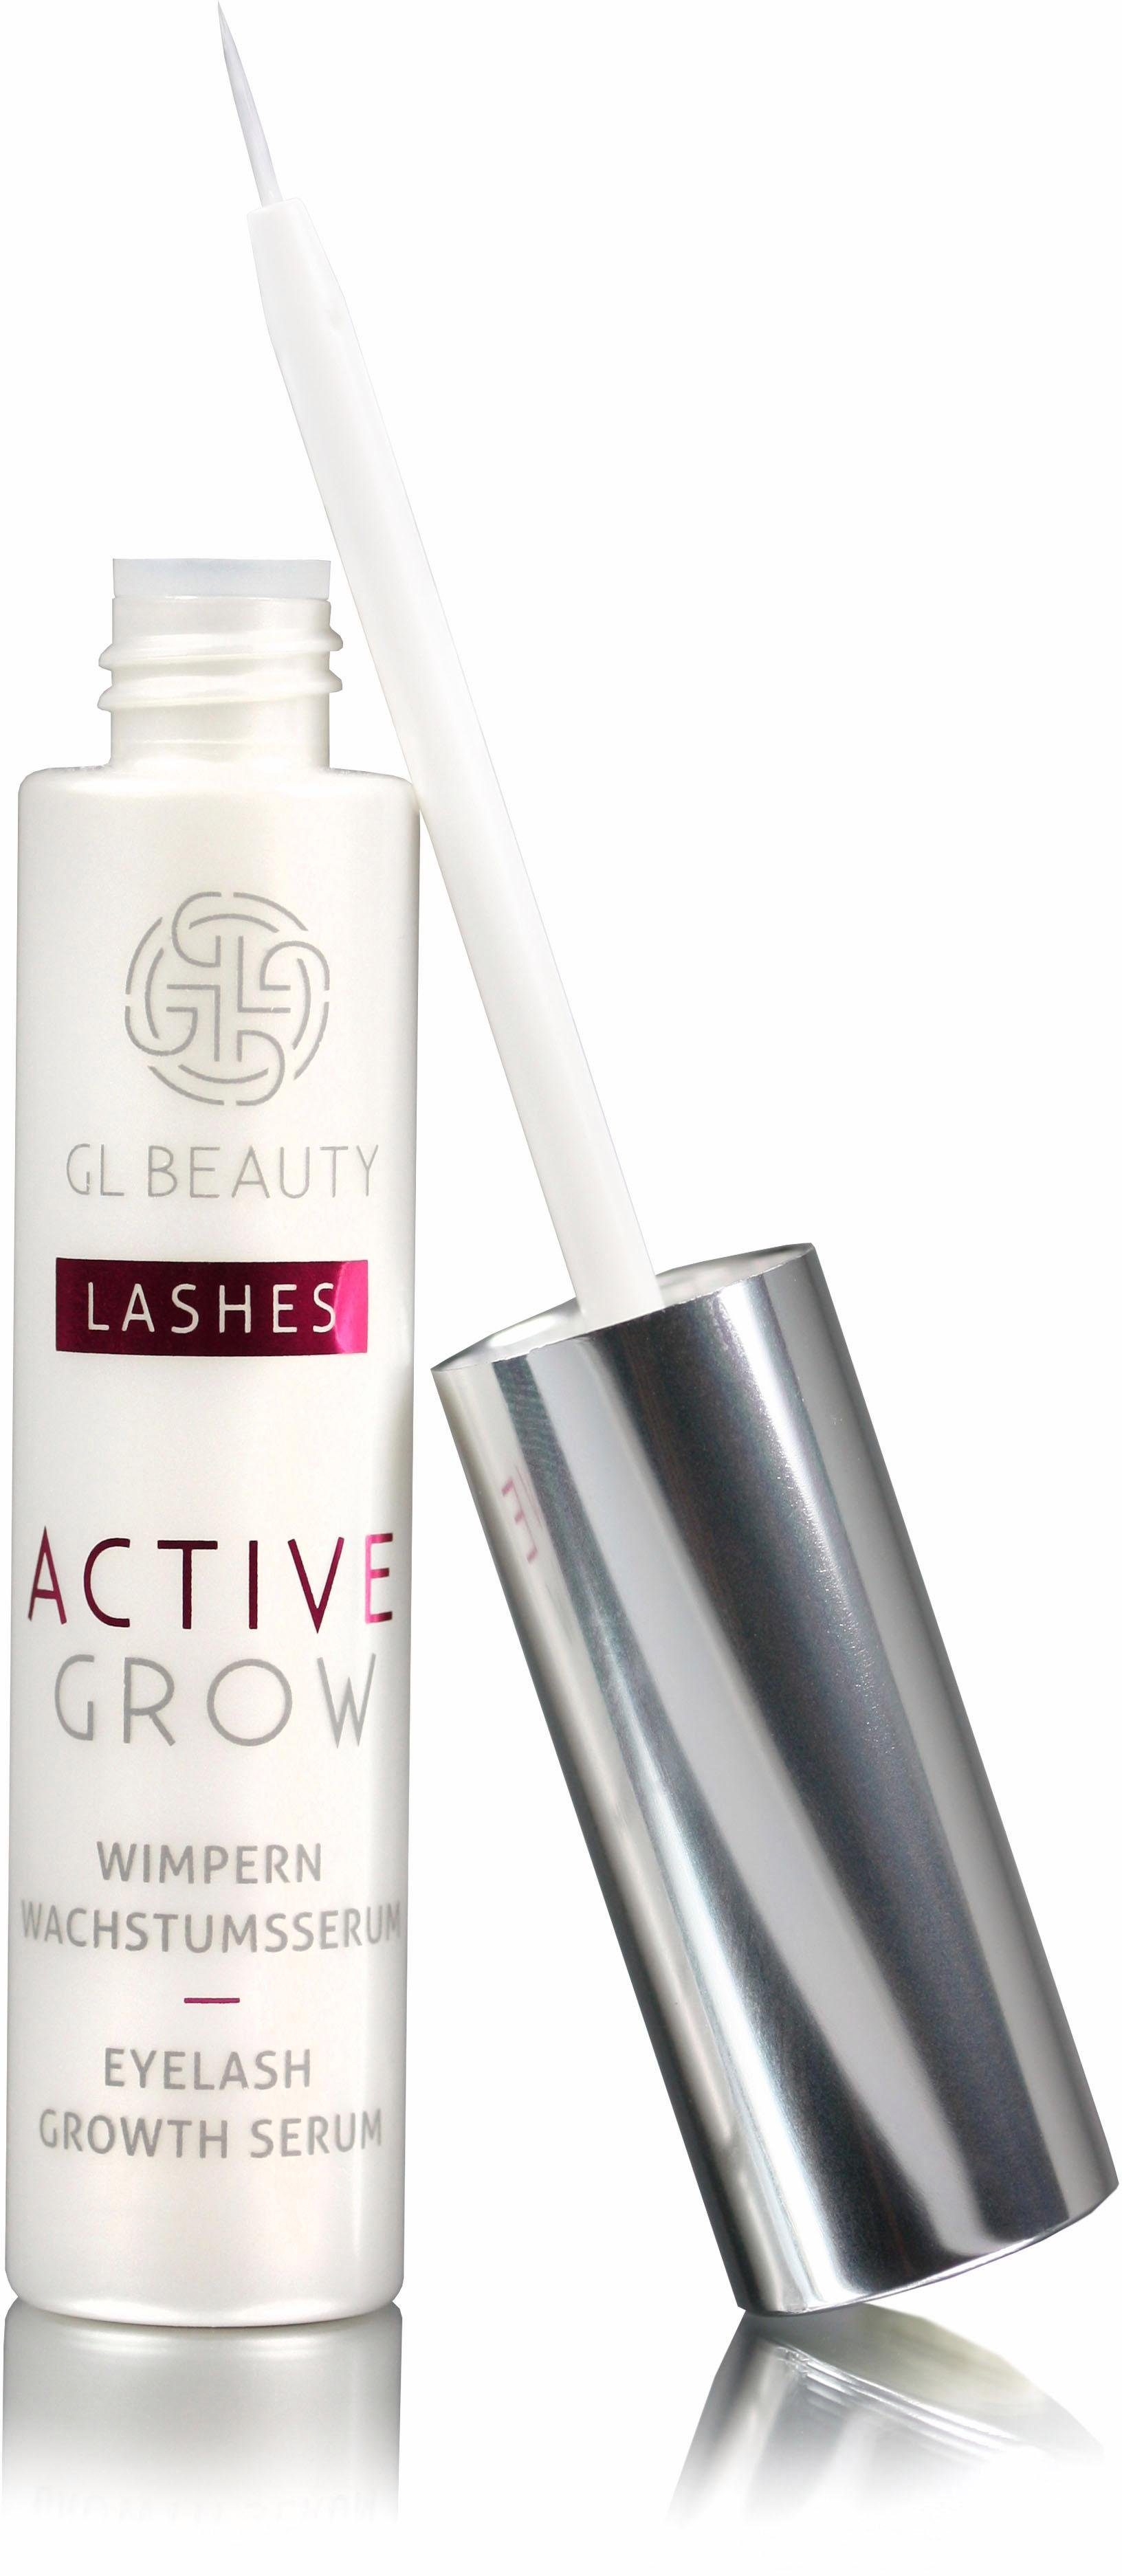 GL Beauty, »Active Grow«, Wimpern Wachstumsserum